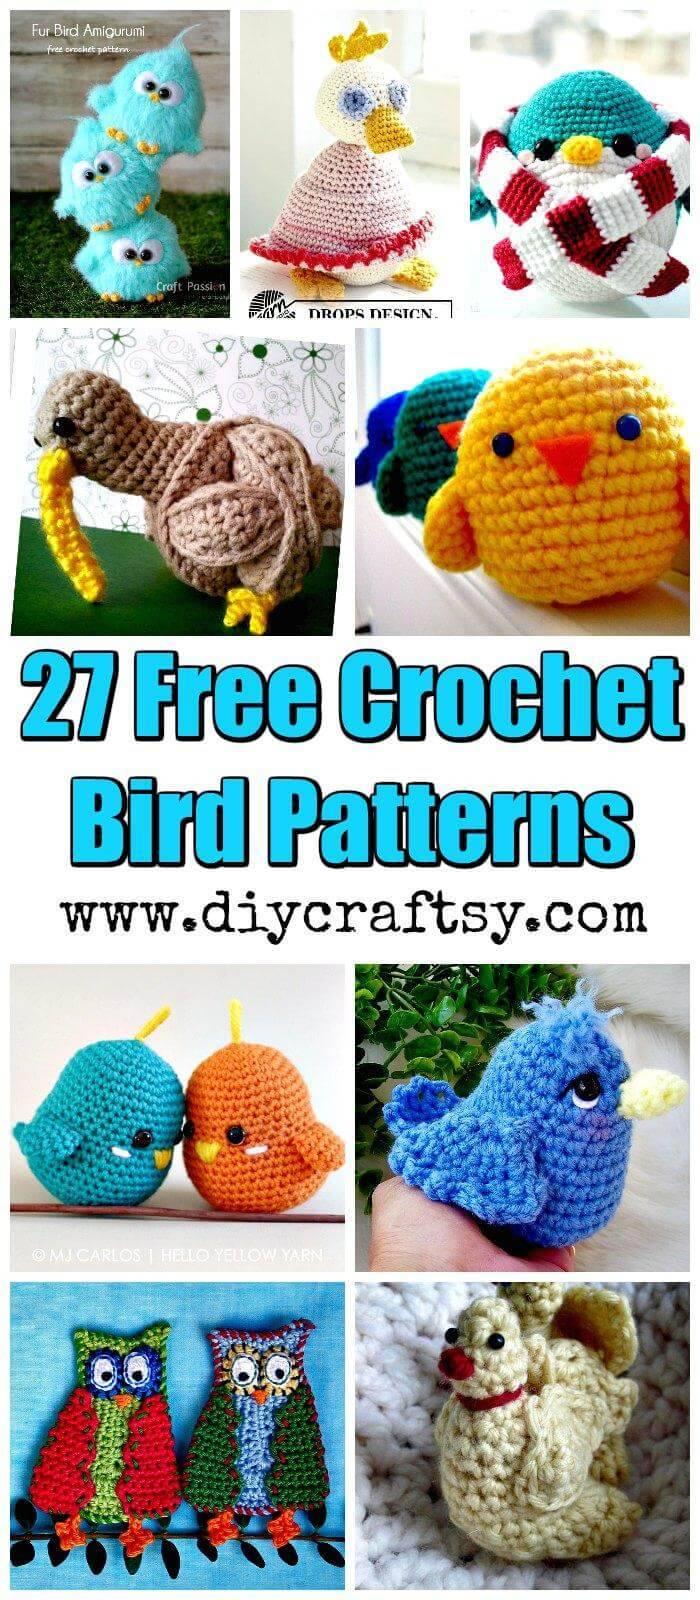 27 Free Crochet Bird Patterns You'll Love